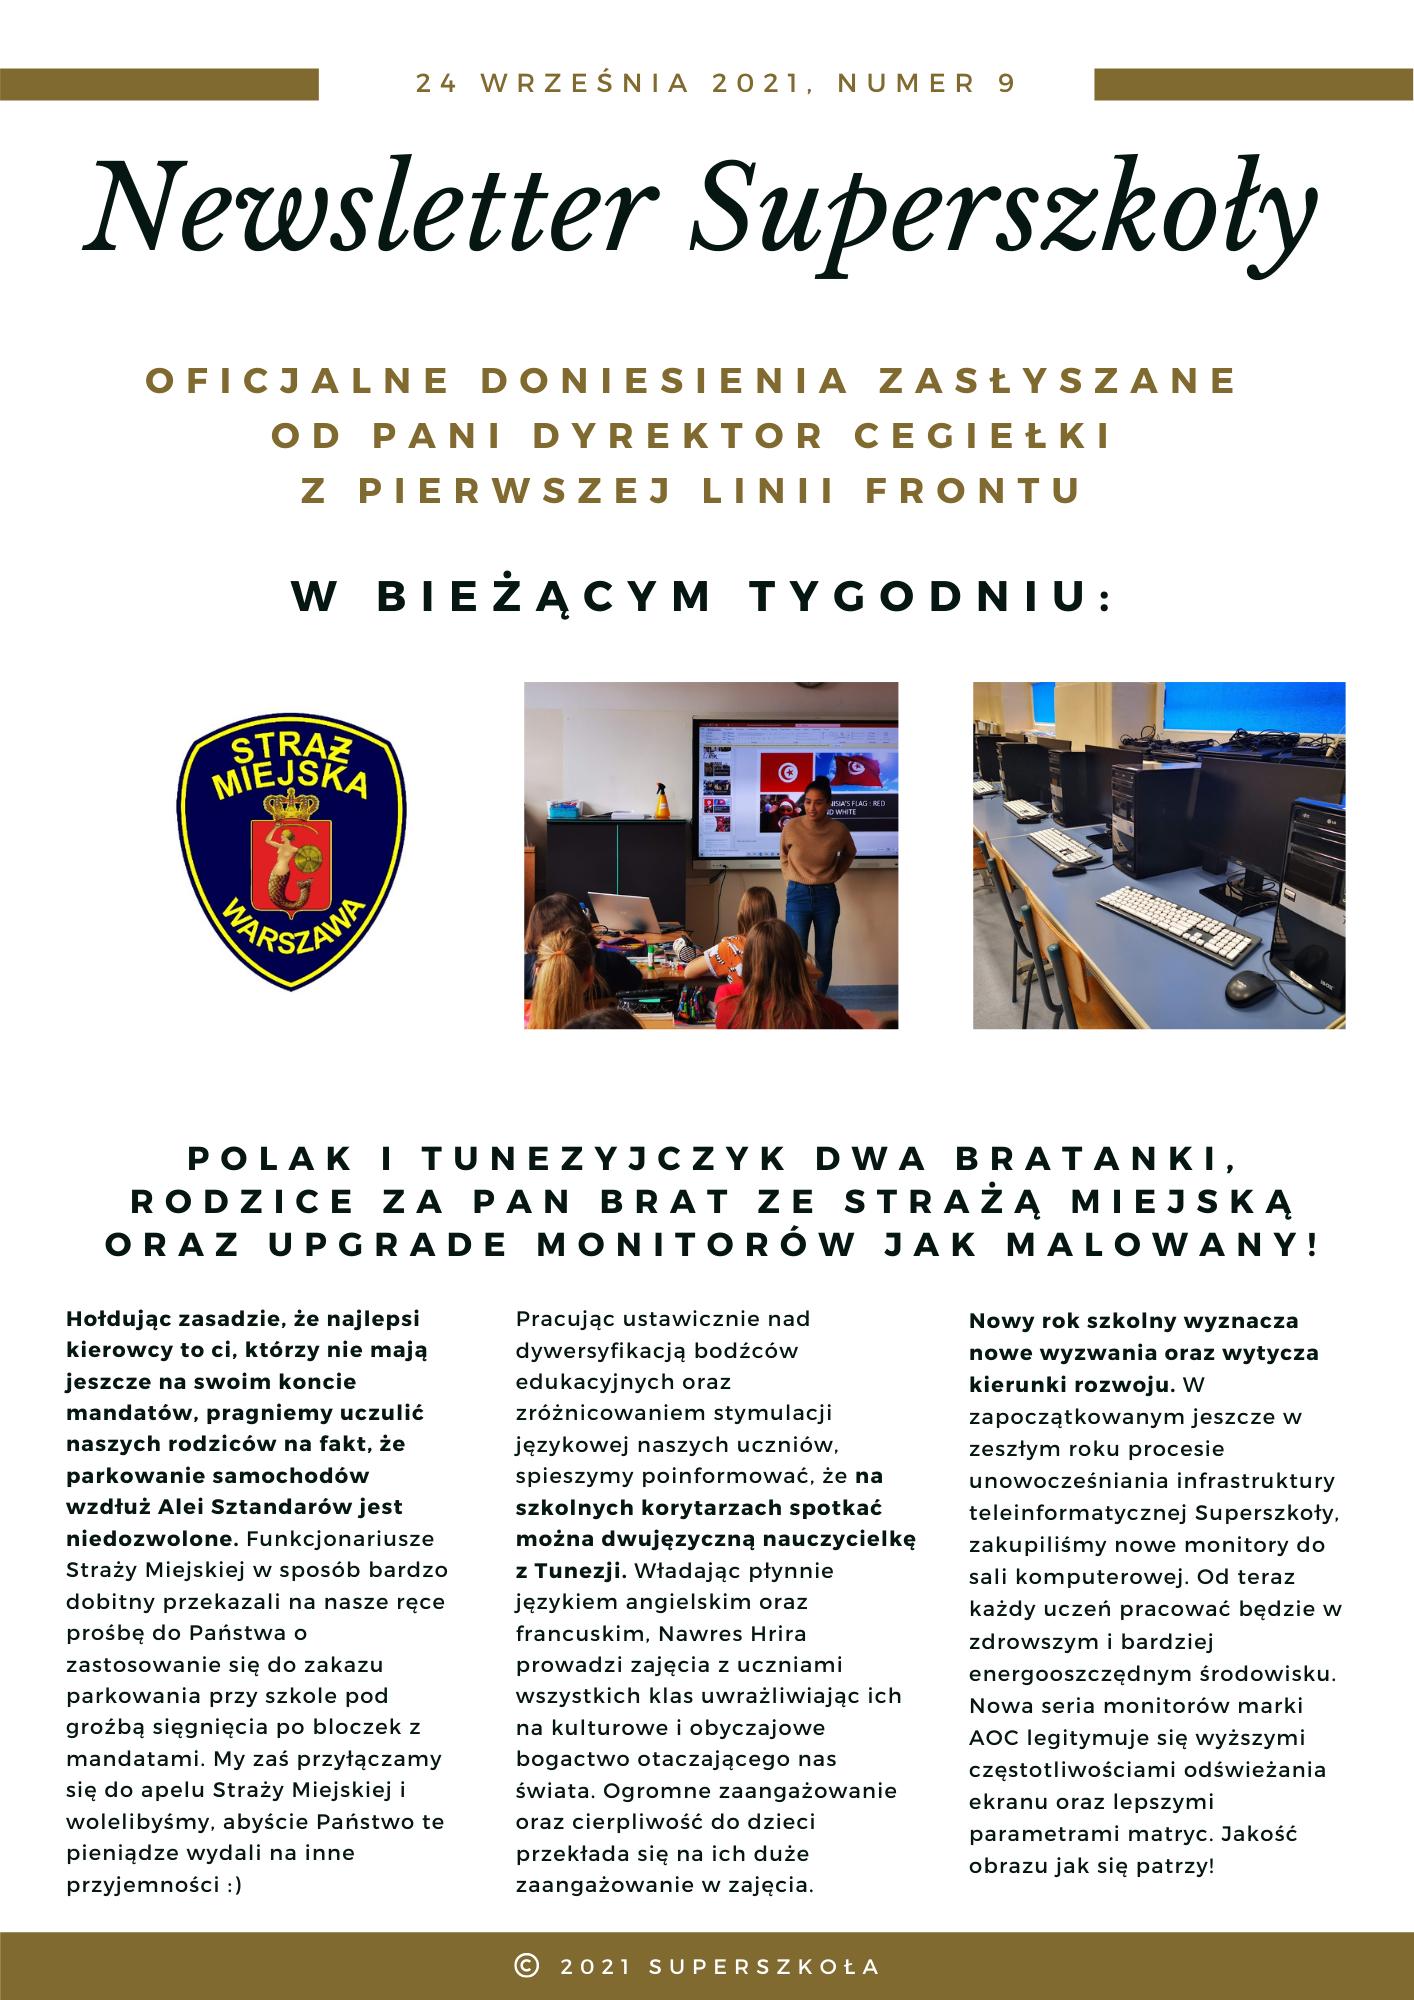 Newsletter_Superszkoły_9